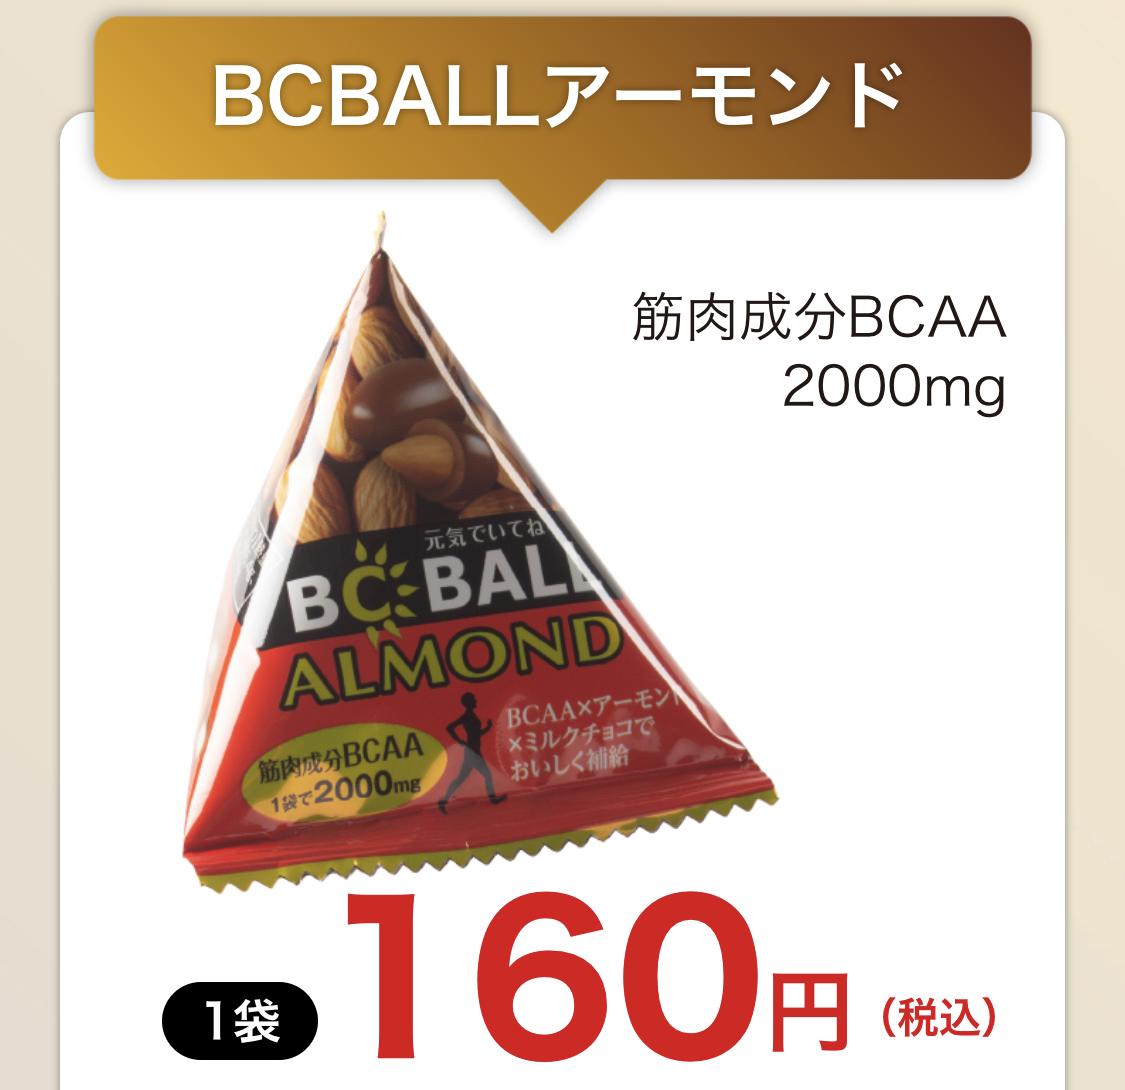 【BCBALL】BCBALLアーモンド5袋セット